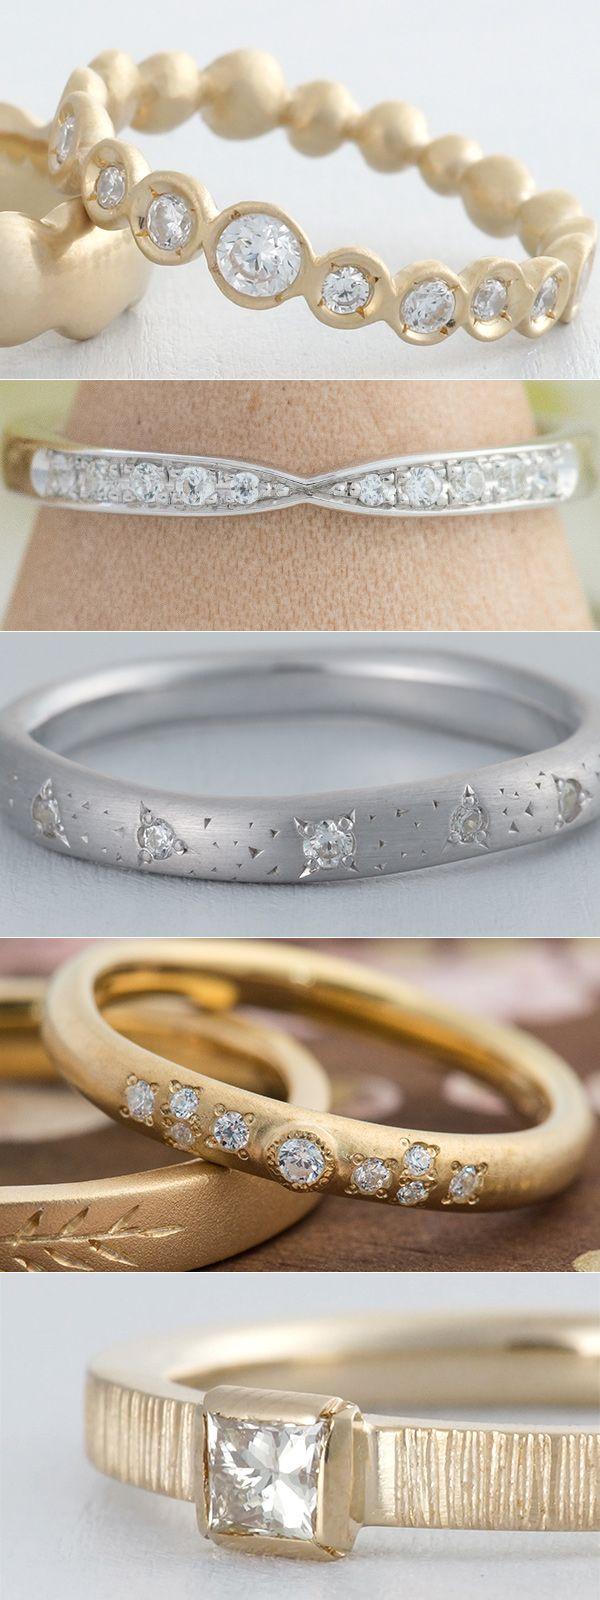 ithのマリッジリング。 石の留め方で印象も変わりますね✴︎  結婚指輪 marriage wedding ring diamond ダイヤモンド gold